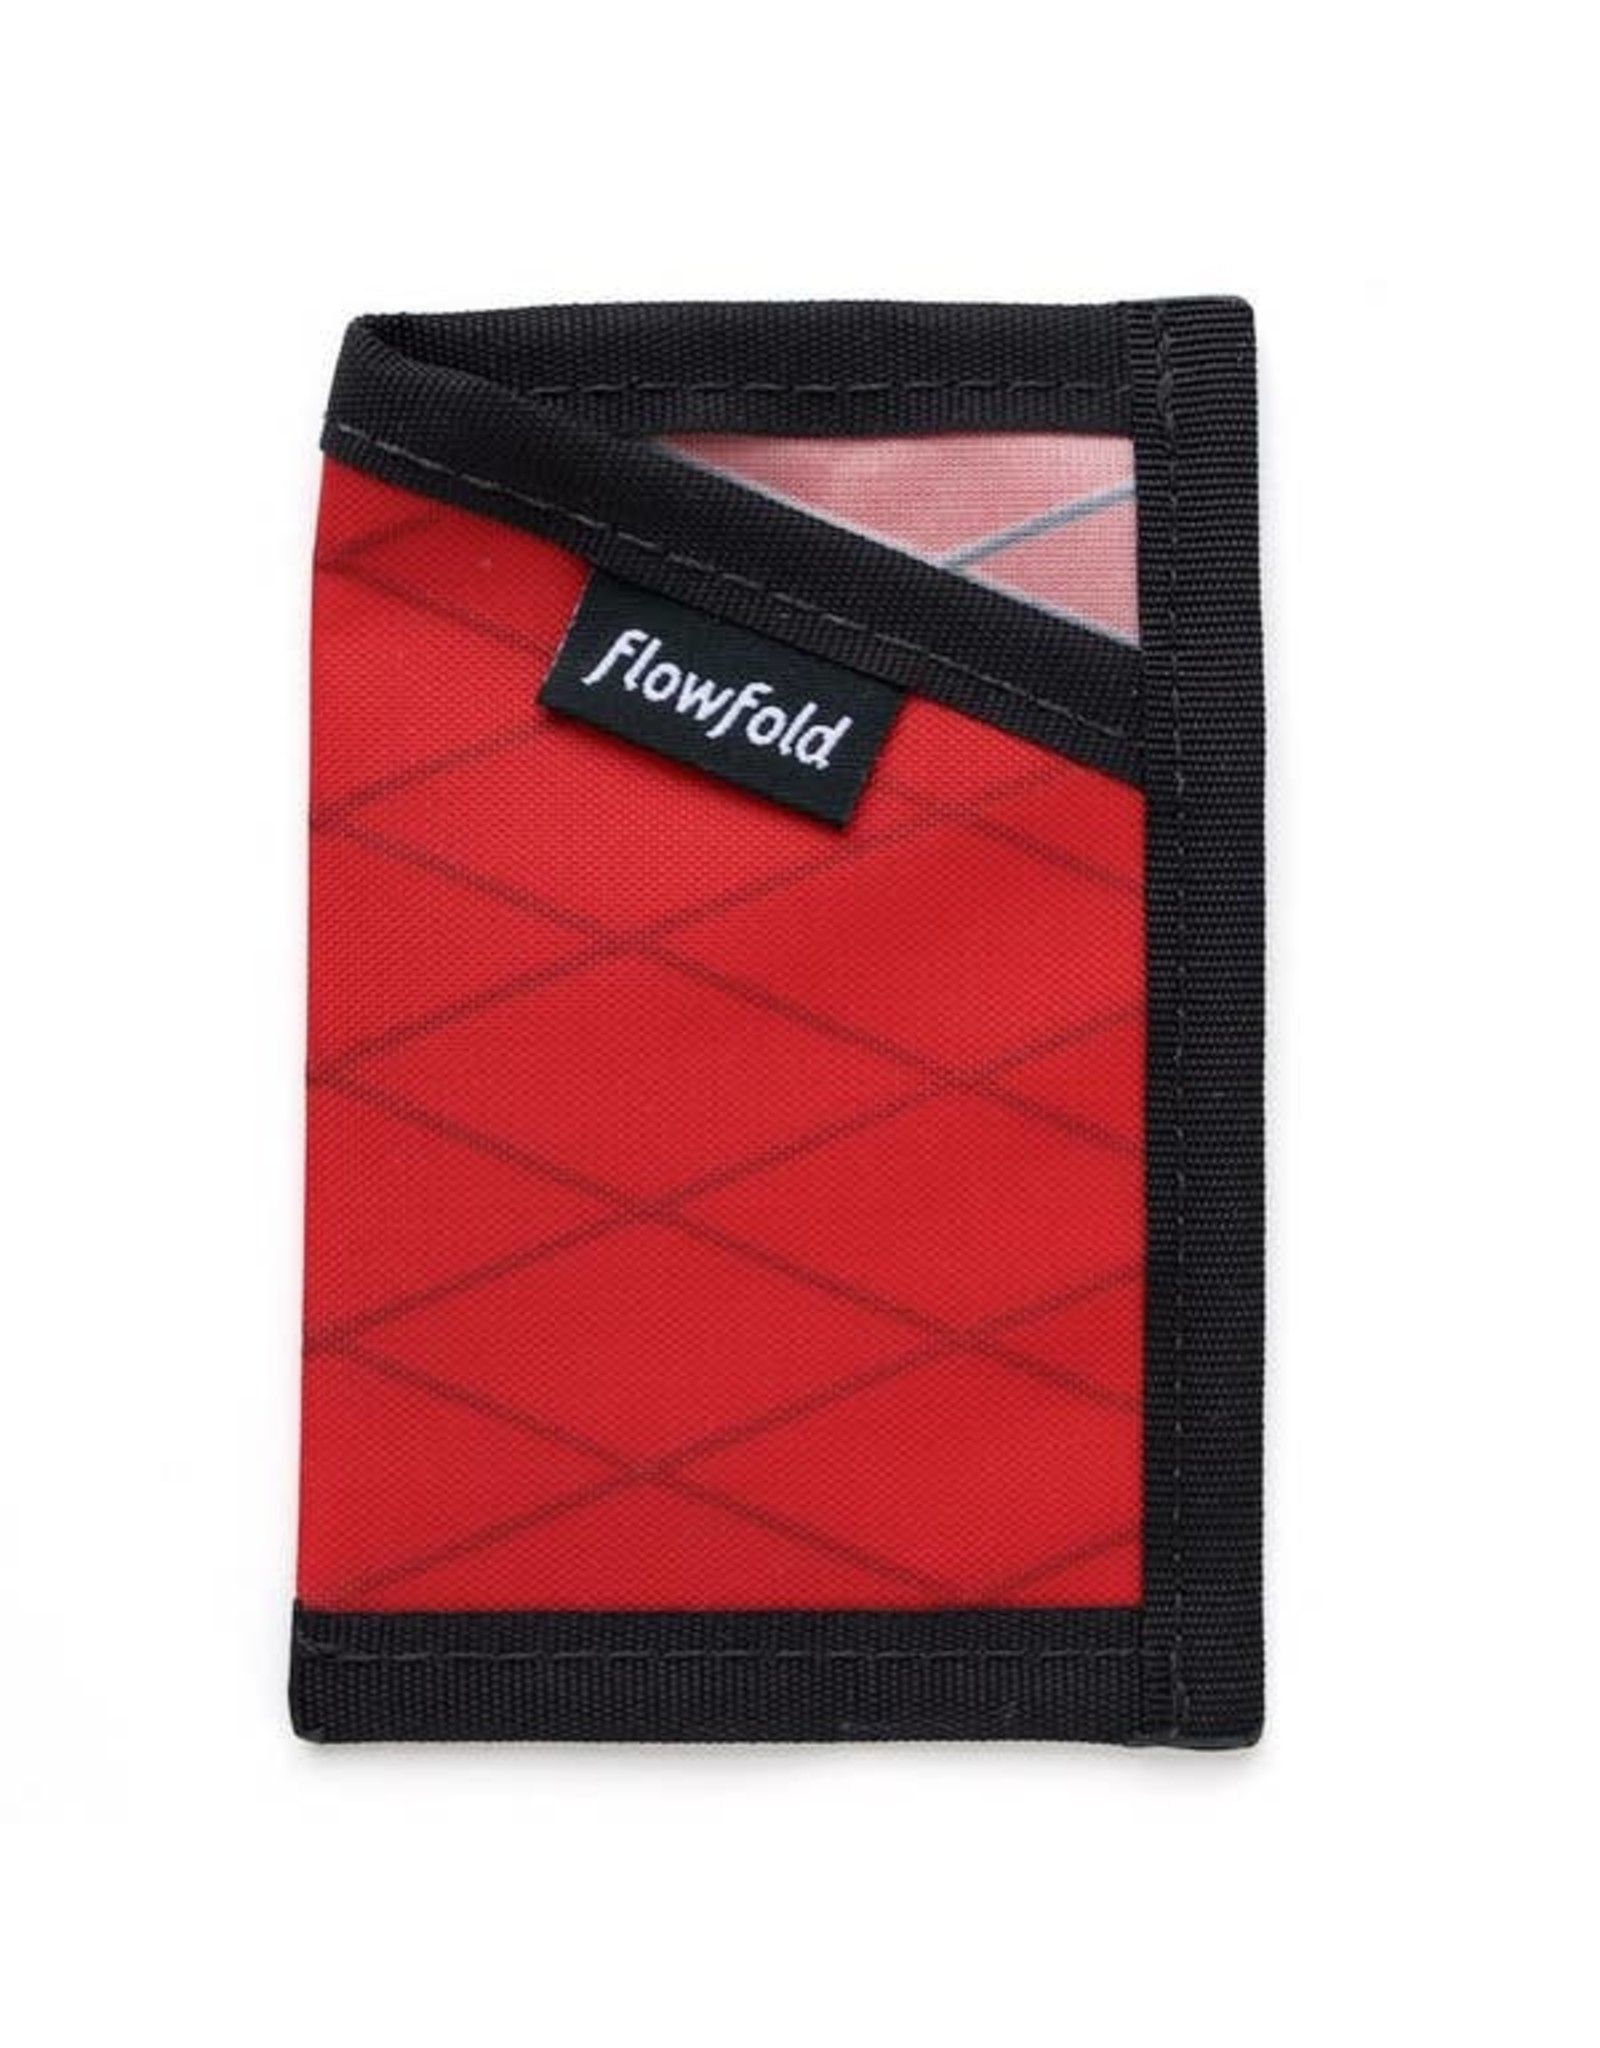 Flowfold Flowfold Minimalist Card Holder